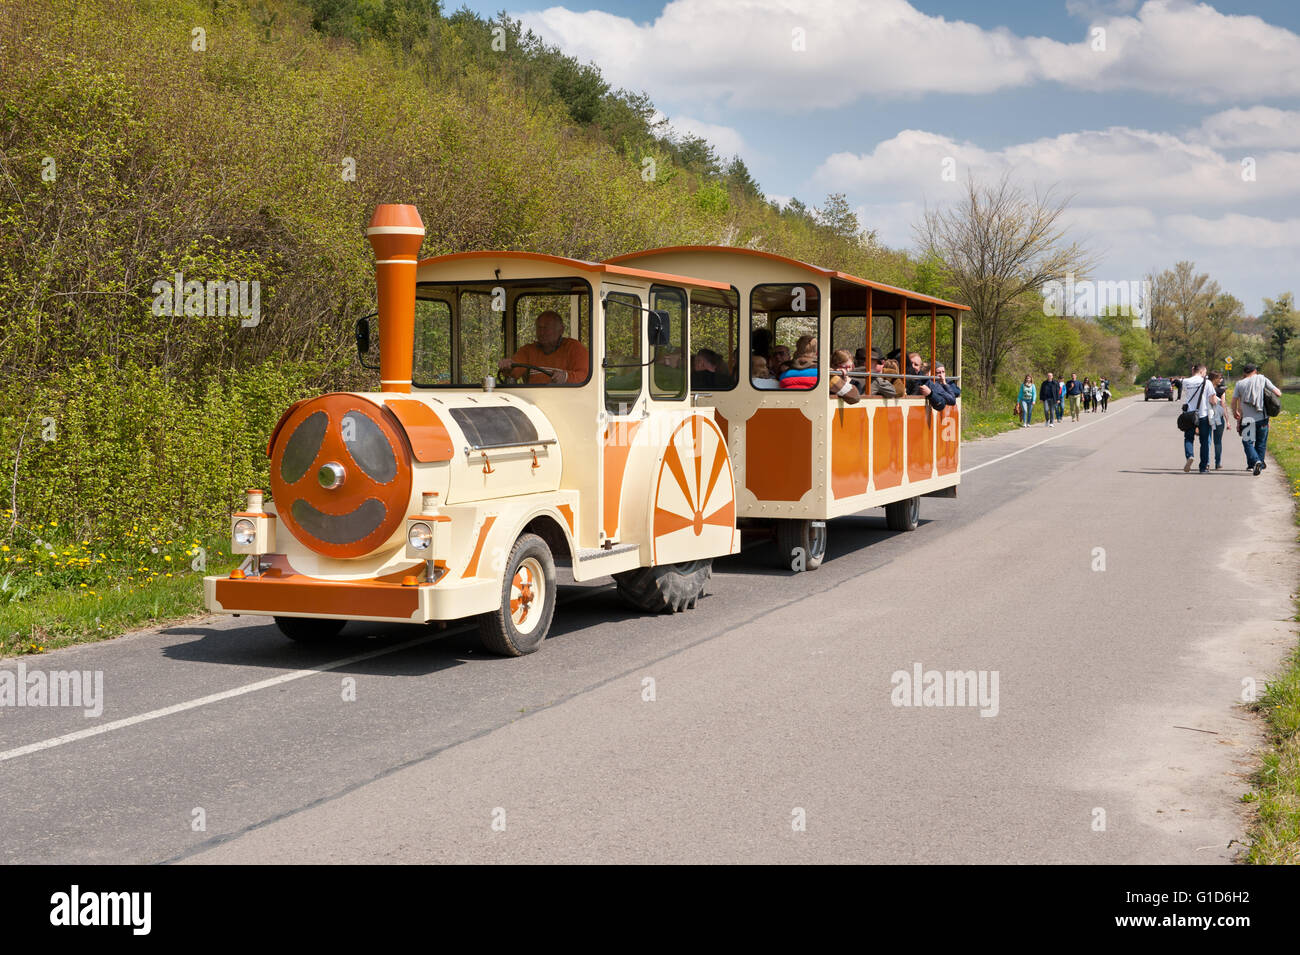 Excursion tractor train tour to Janowiec near Kazimierz Dolny, Poland, Europe, local locomotive vehicle imitation - Stock Image